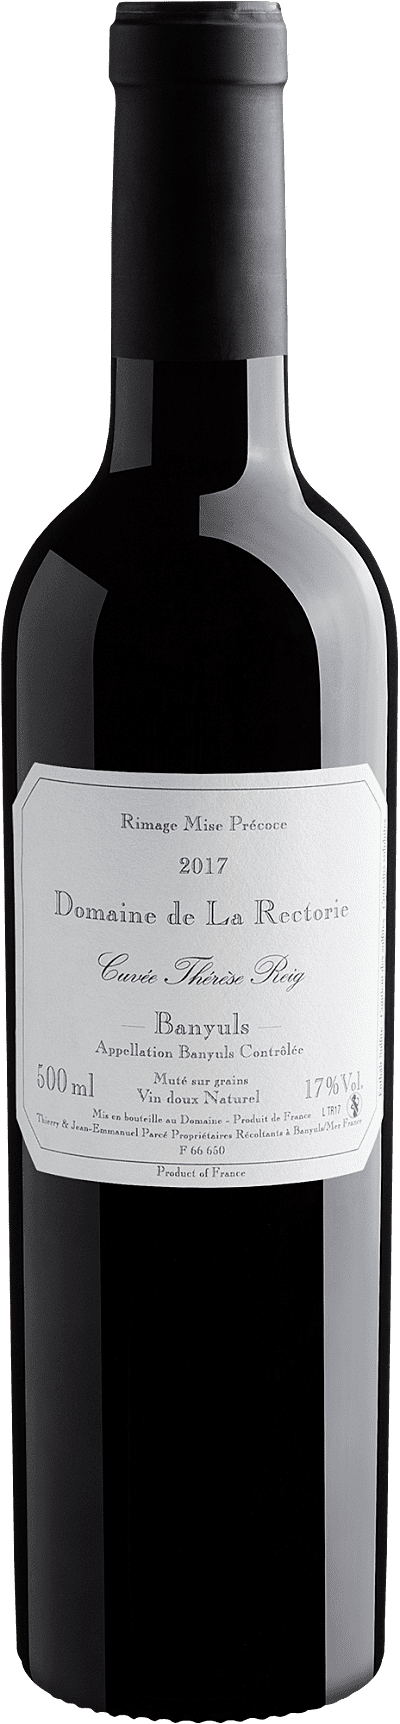 Vinho Fortificado - Domaine de La Rectorie Banyuls Rimage Therese Reig 2017 50cl - França